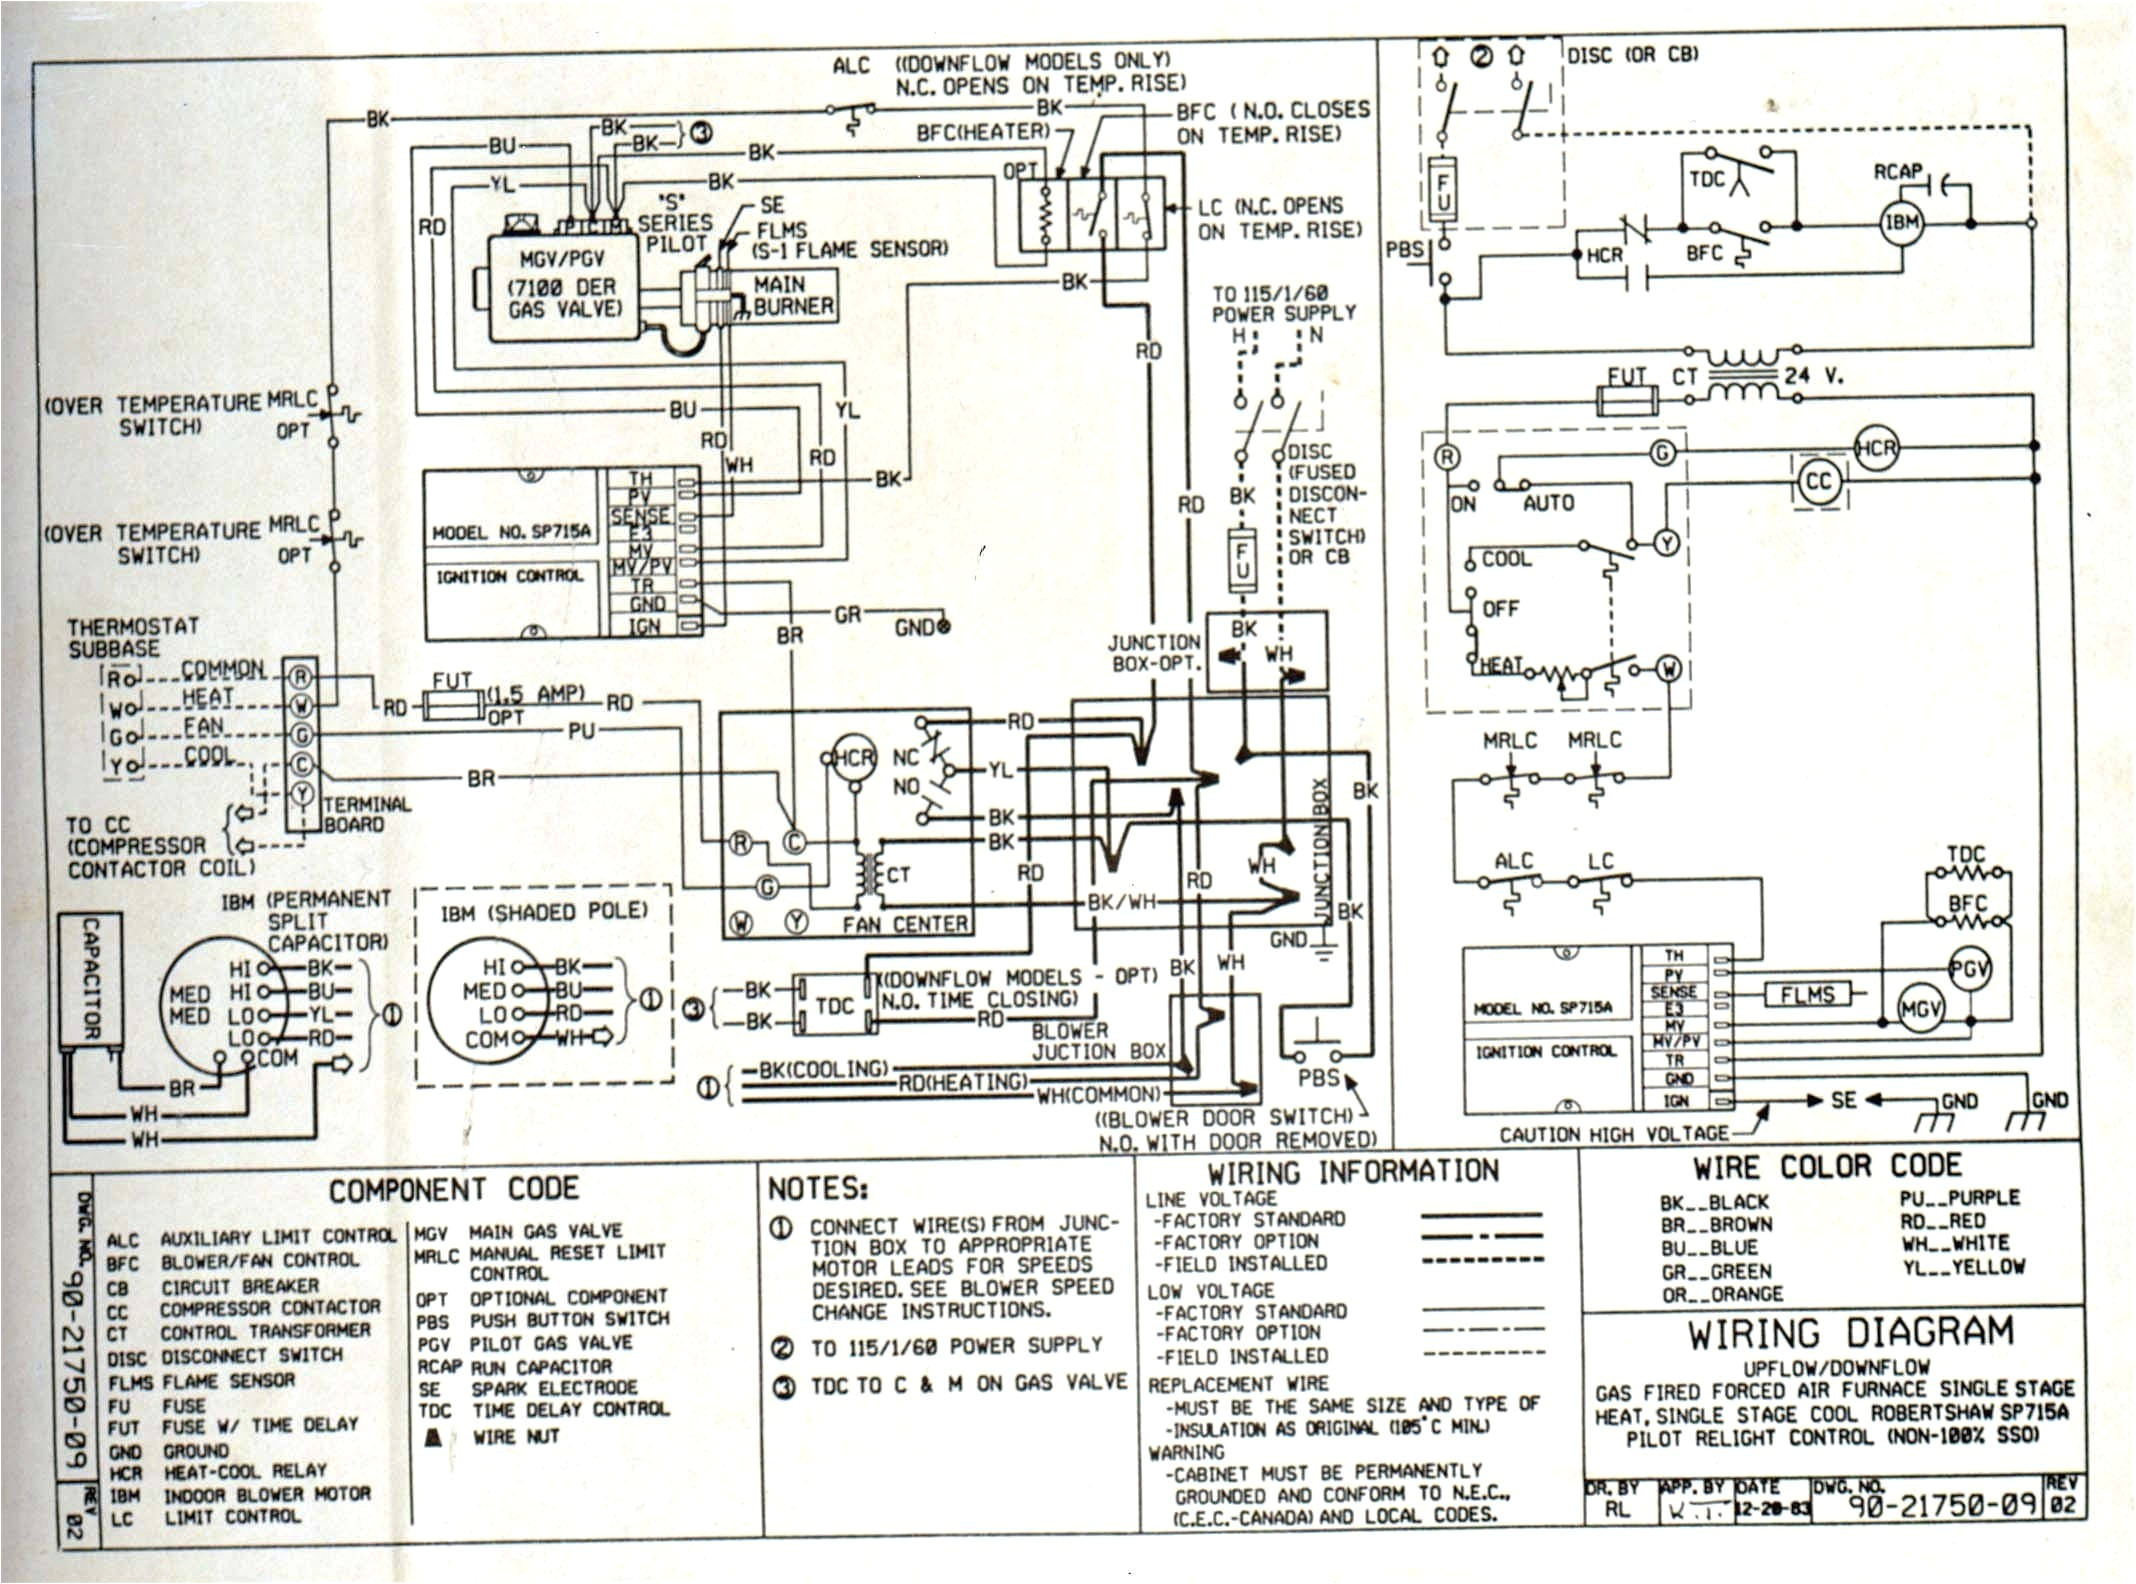 Ahu Control Panel Wiring Diagram Ahu Control Panel Wiring Diagram Best Of Cu Faculty Architecture